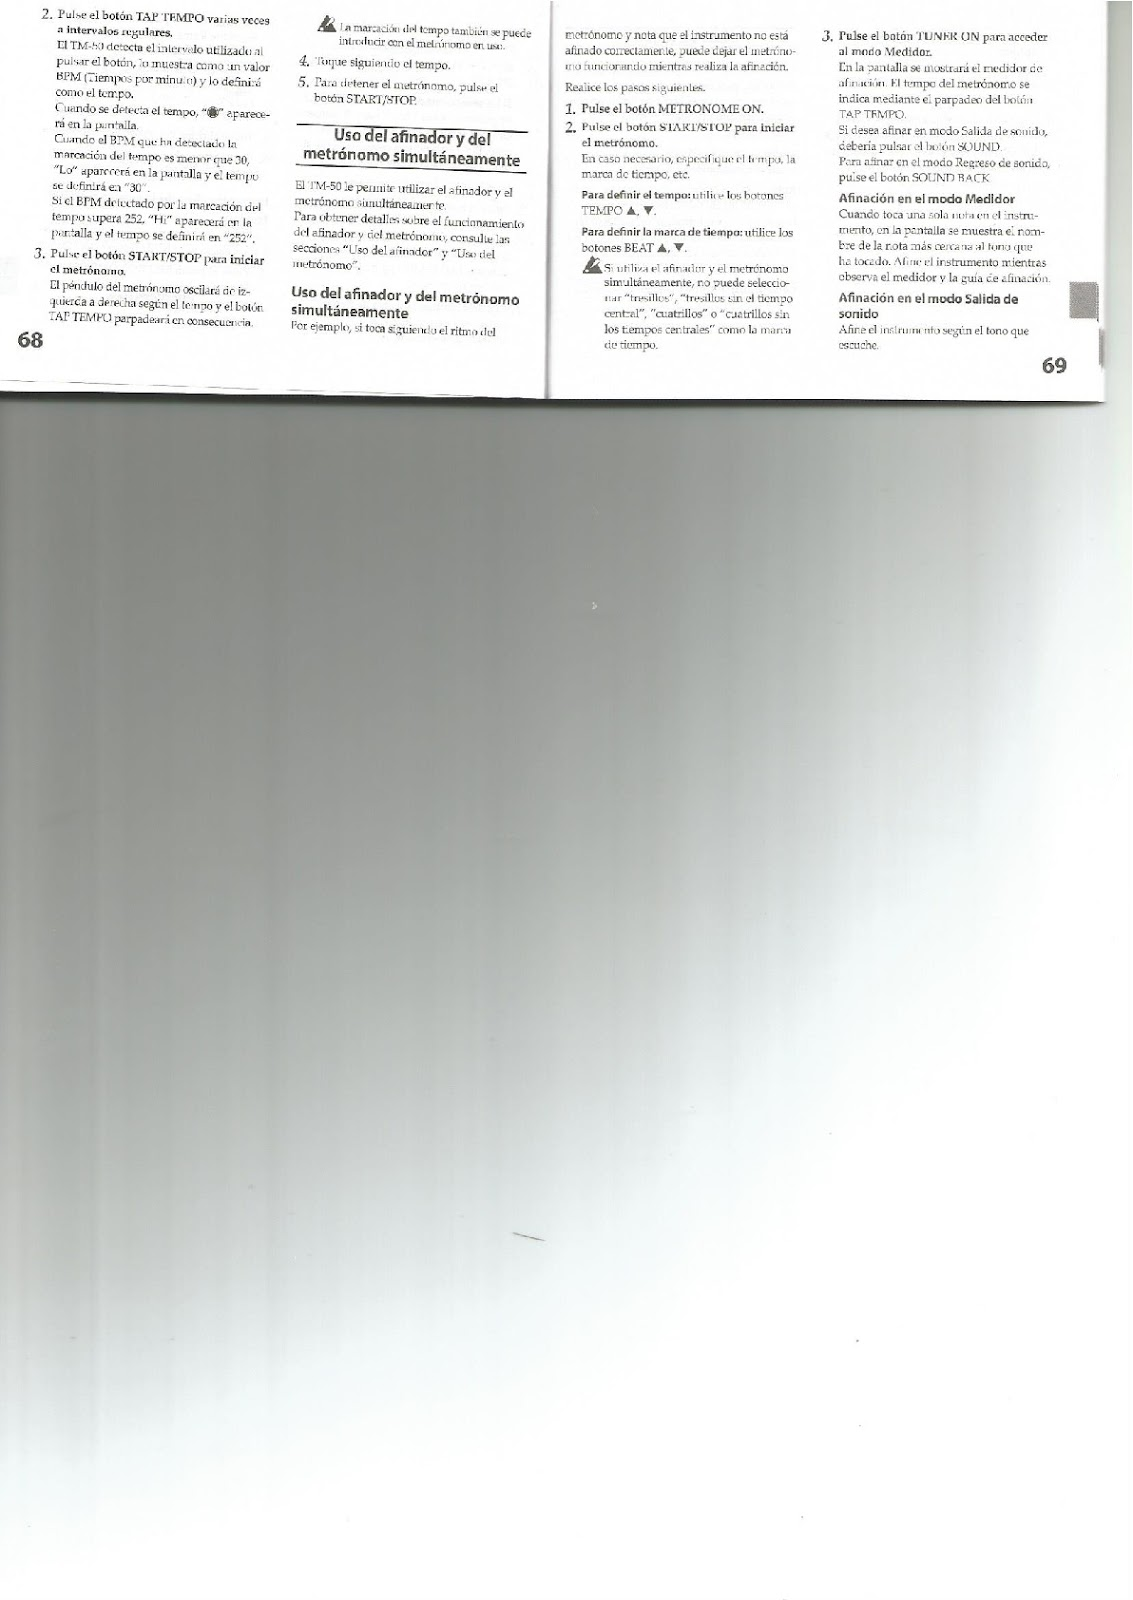 manuaisequiposPDF-025.jpg